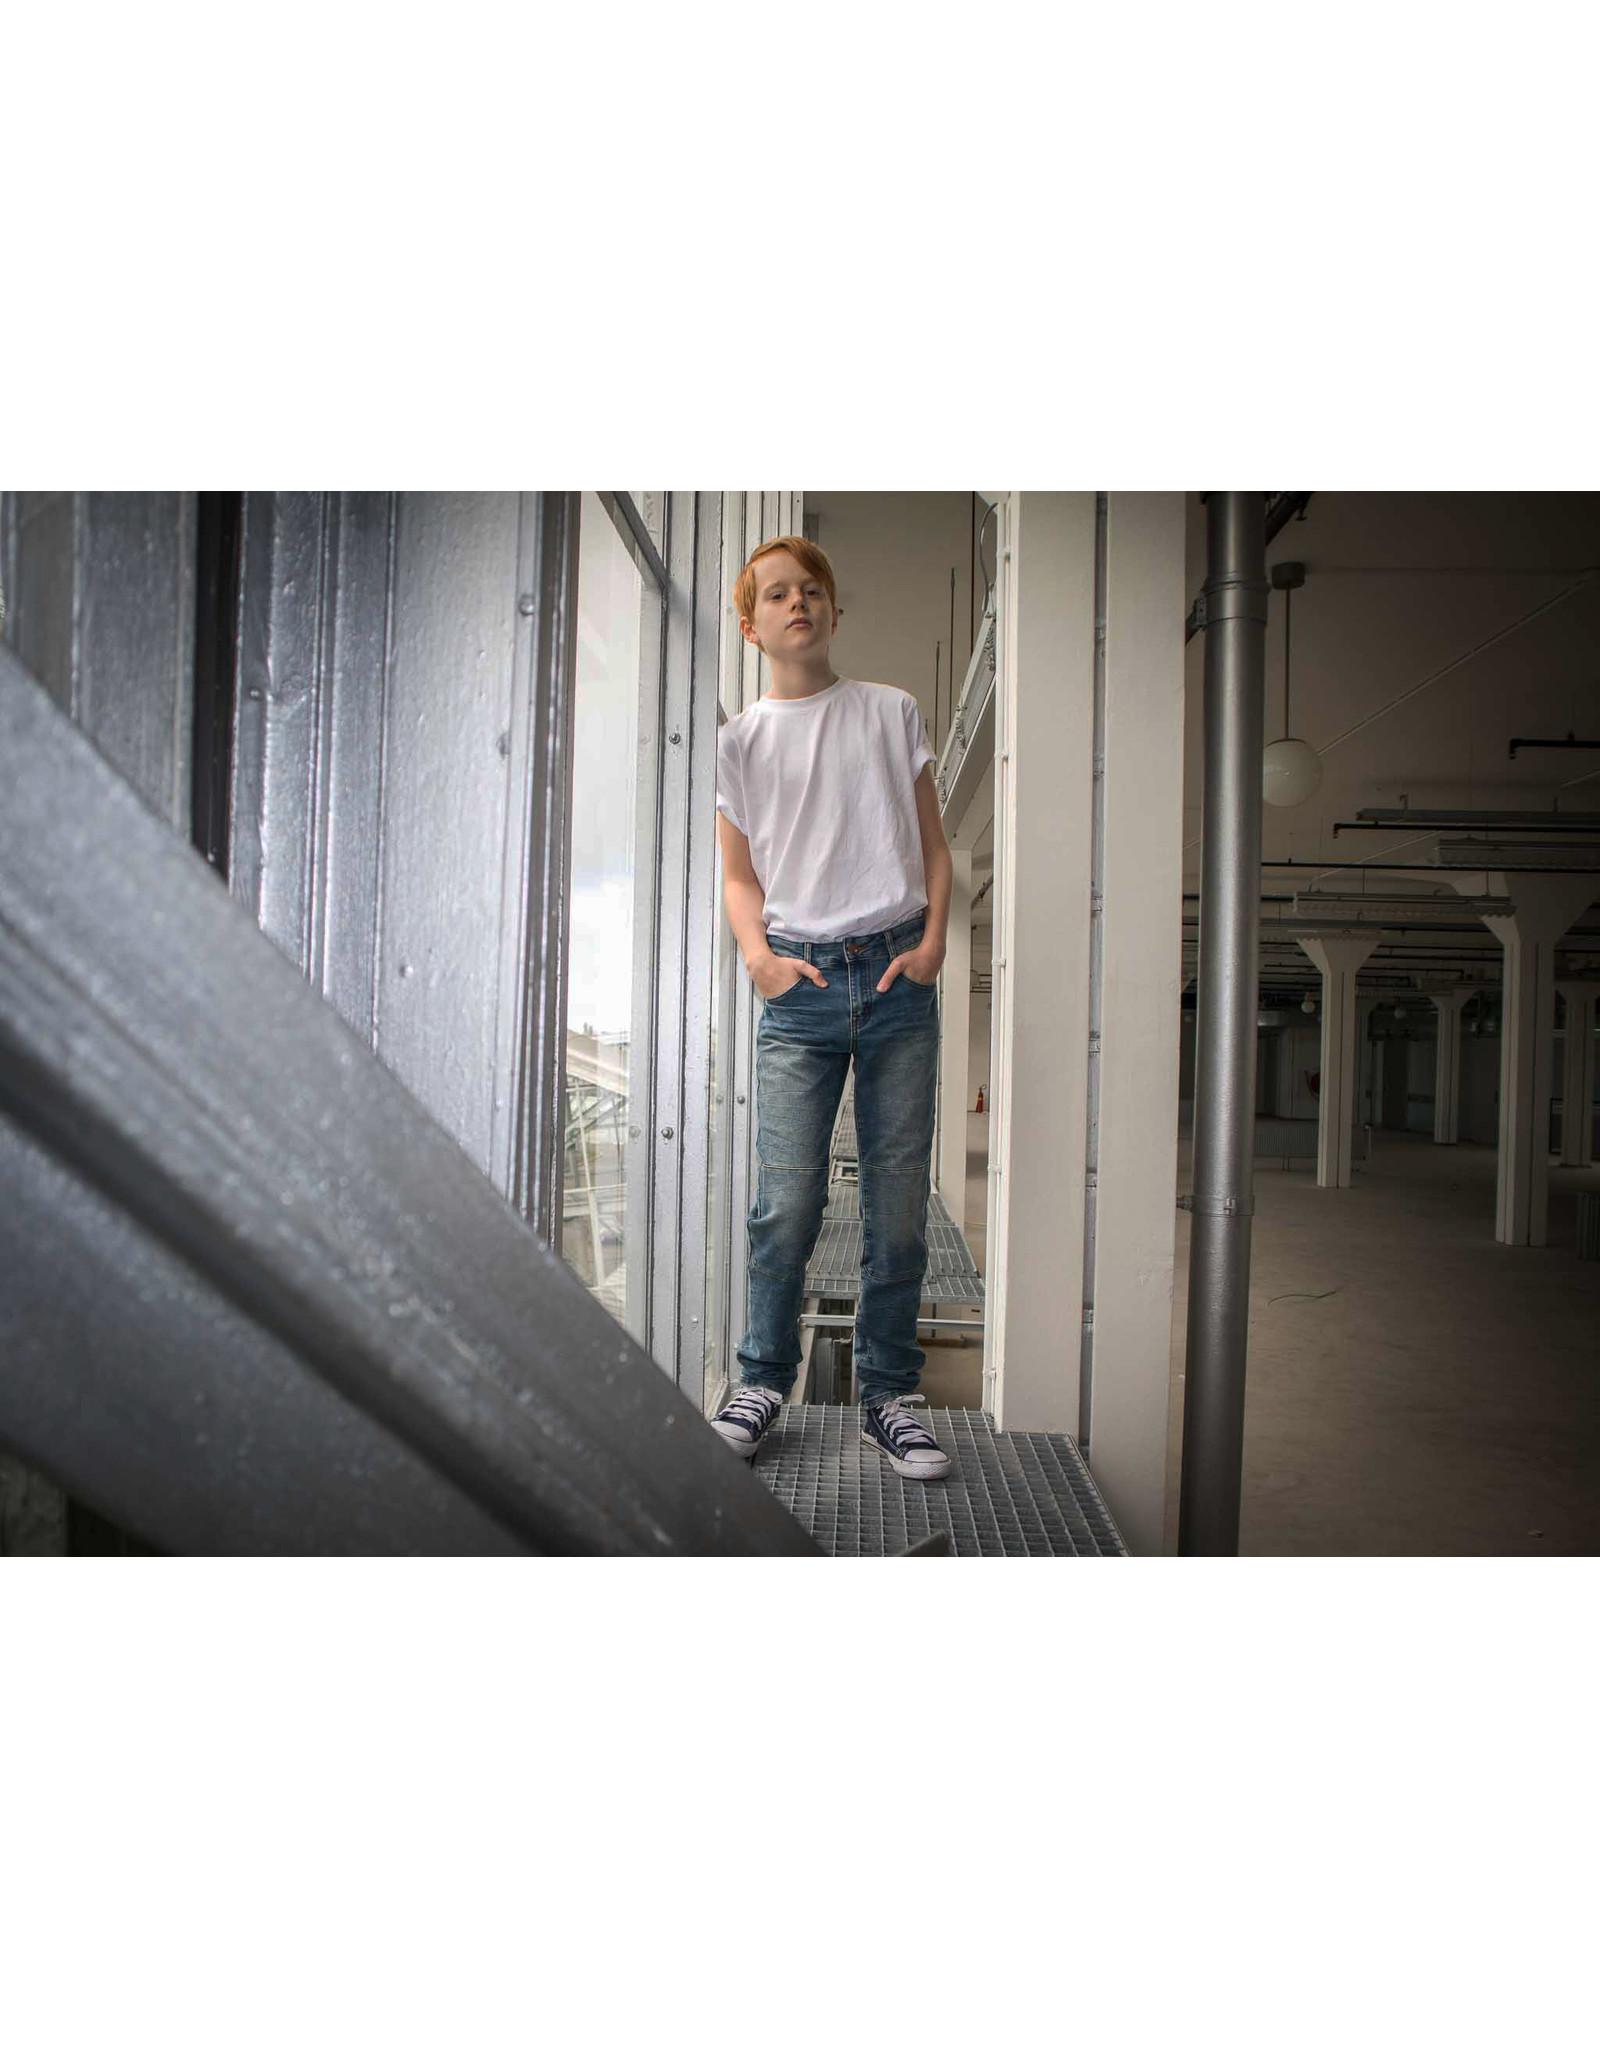 Dutch dream denim UMBILE, EXTRA SLIM FIT Jogg jeans met dubbele laag stof op de knieën